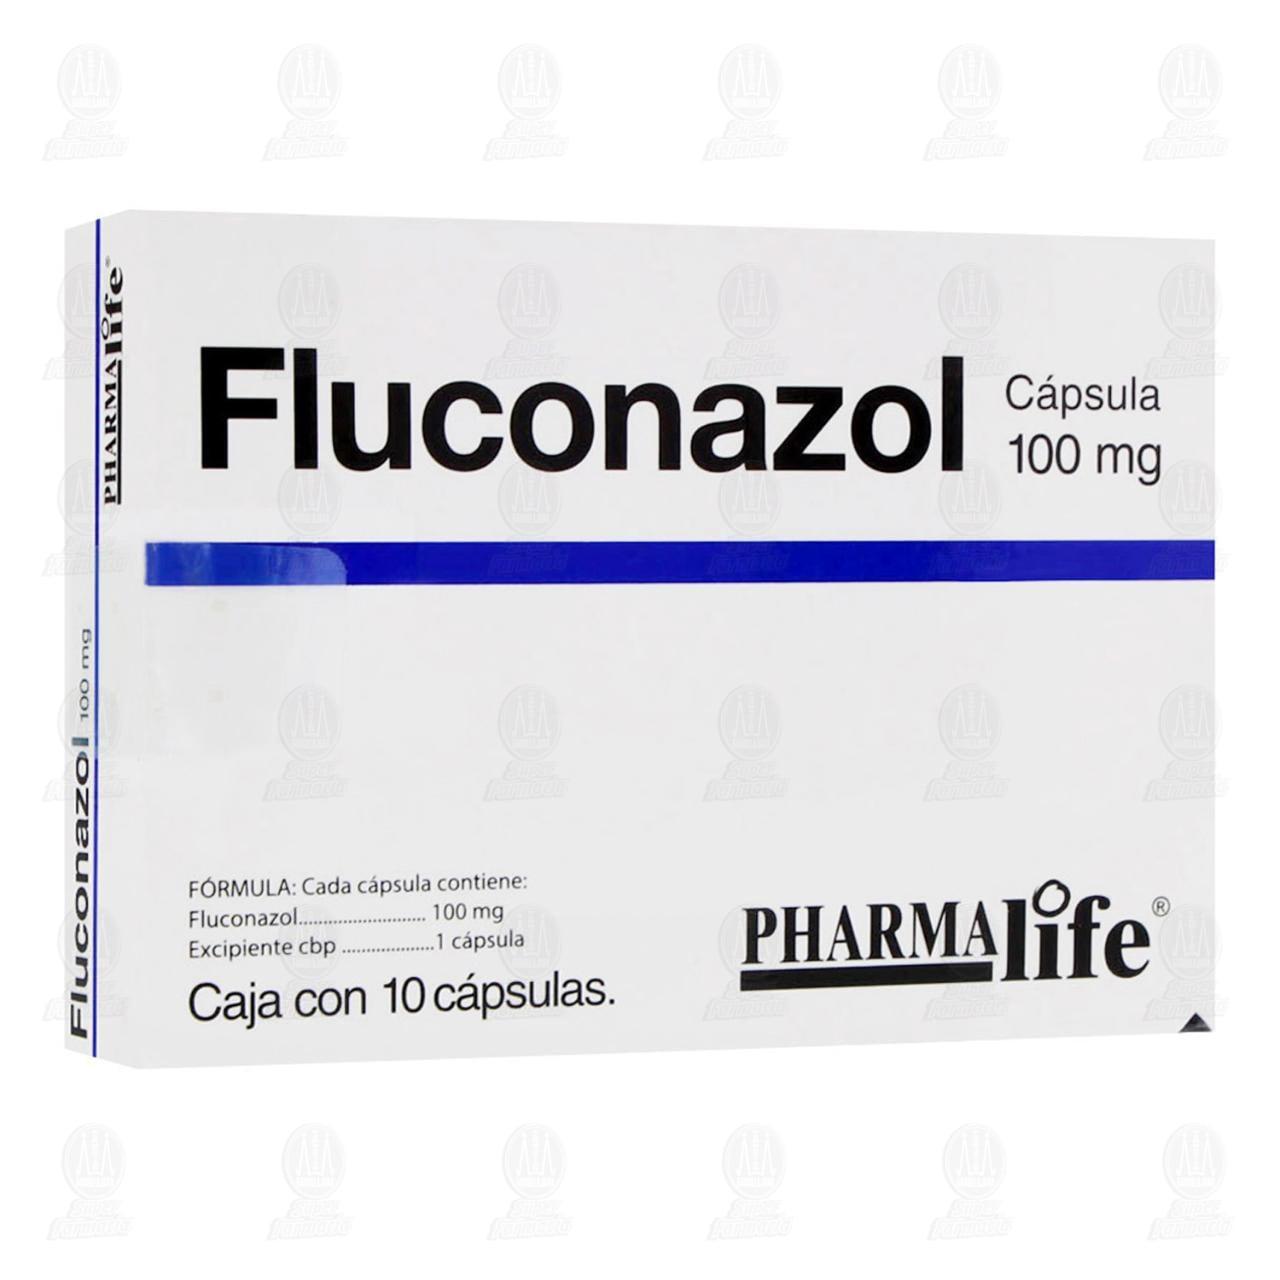 Comprar Fluconazol 100mg 10 Cápsulas Pharmalife en Farmacias Guadalajara